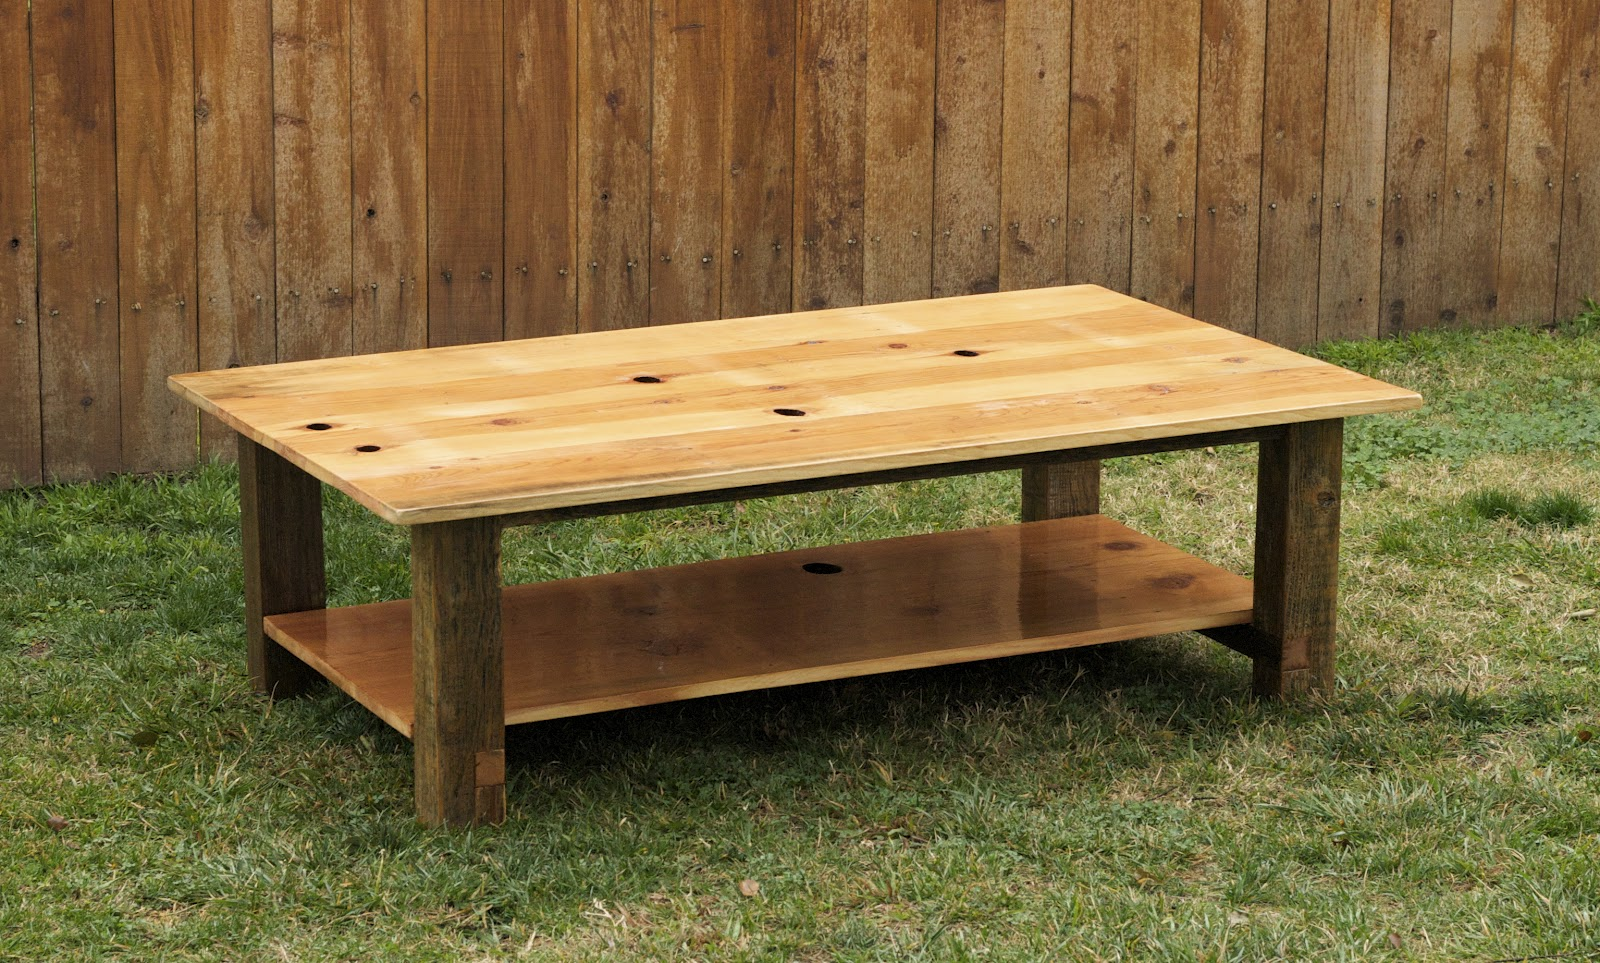 Sugar Pine Furniture